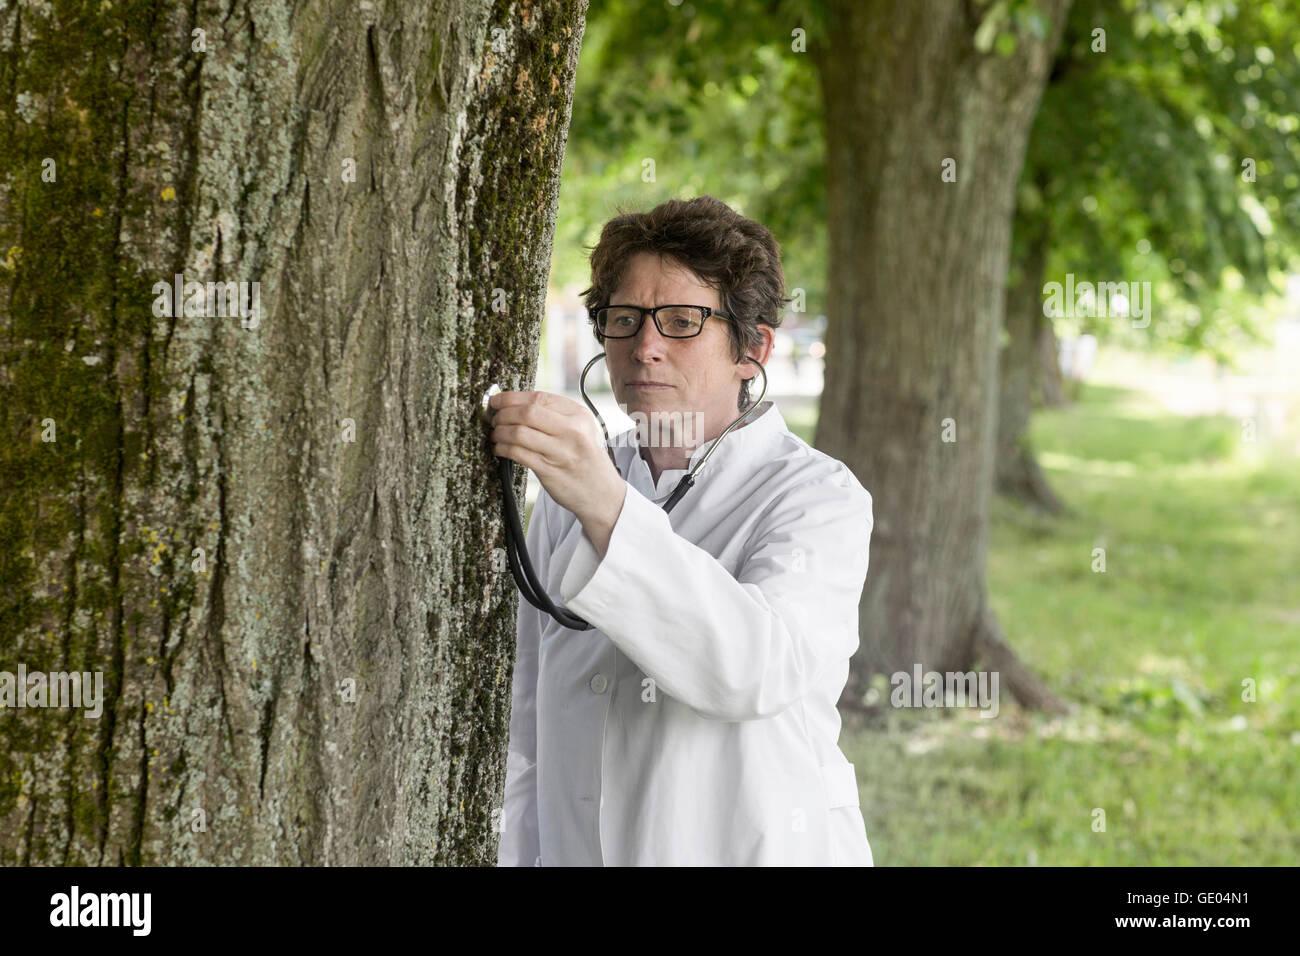 Female doctor checking the health of tree, Freiburg im Breisgau, Baden-Württemberg, Germany - Stock Image